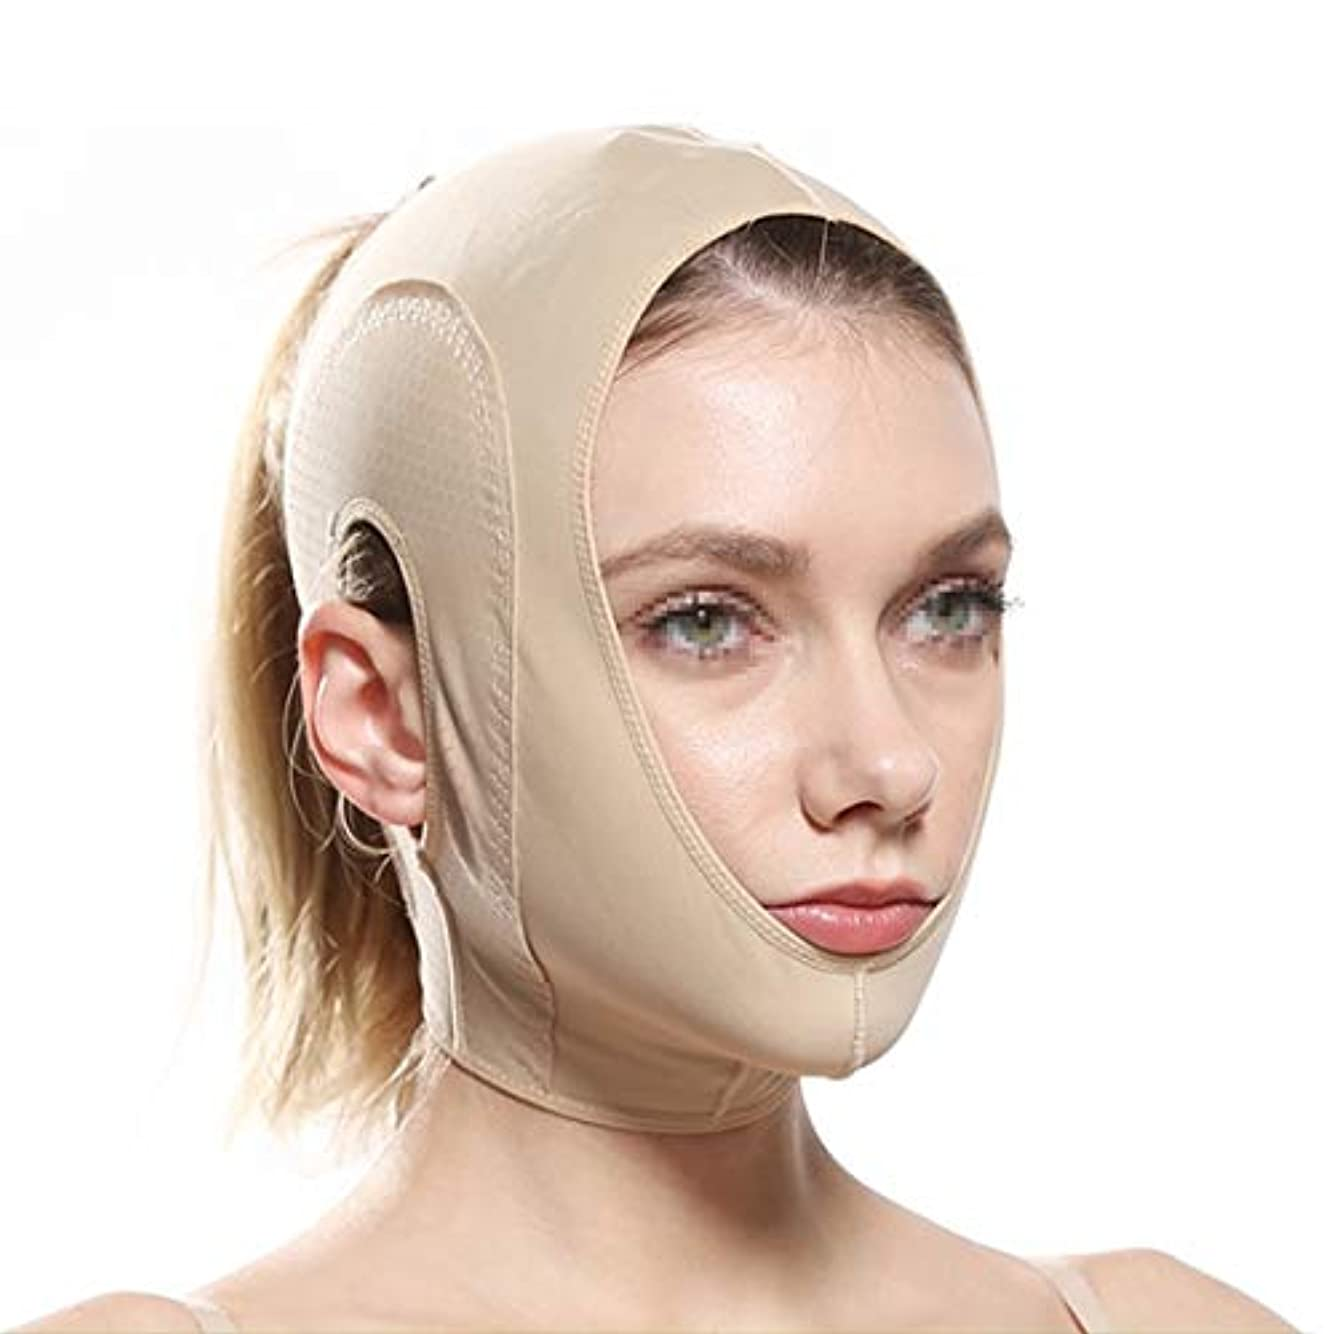 ZWBD フェイスマスク, フェイスリフティング包帯vフェイスフェイスしわvフェイス包帯美容マスクリフトタイトビューティー